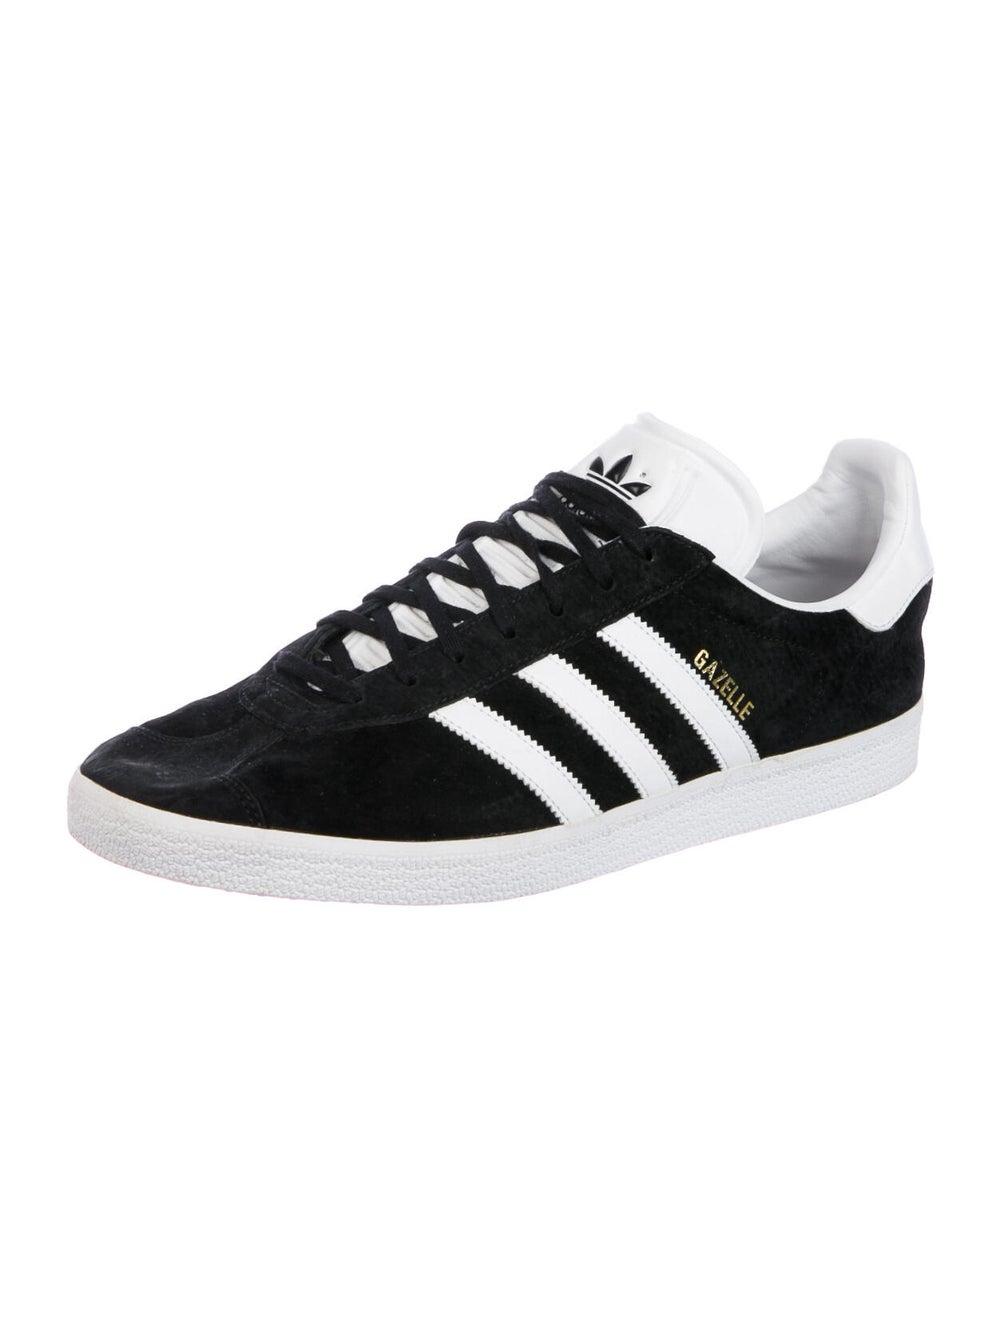 Adidas Gazelle Sneakers Black - image 2